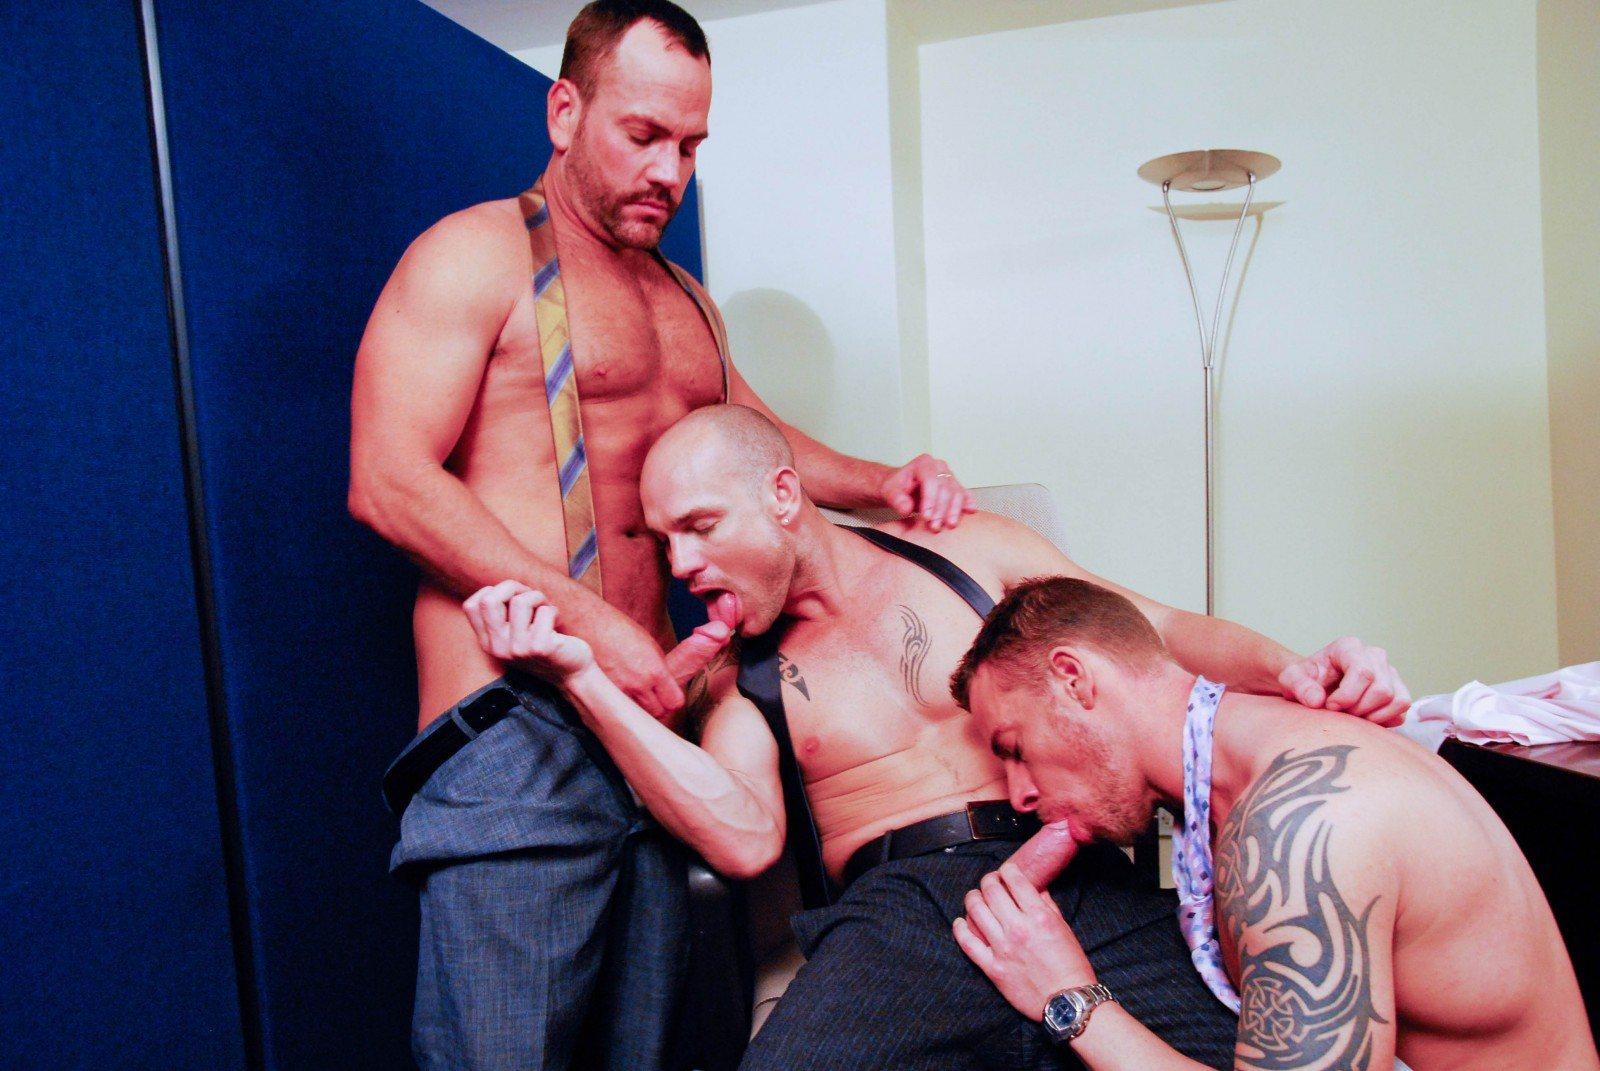 Jake Ryder, Kurt Rogers and Matthew Ford